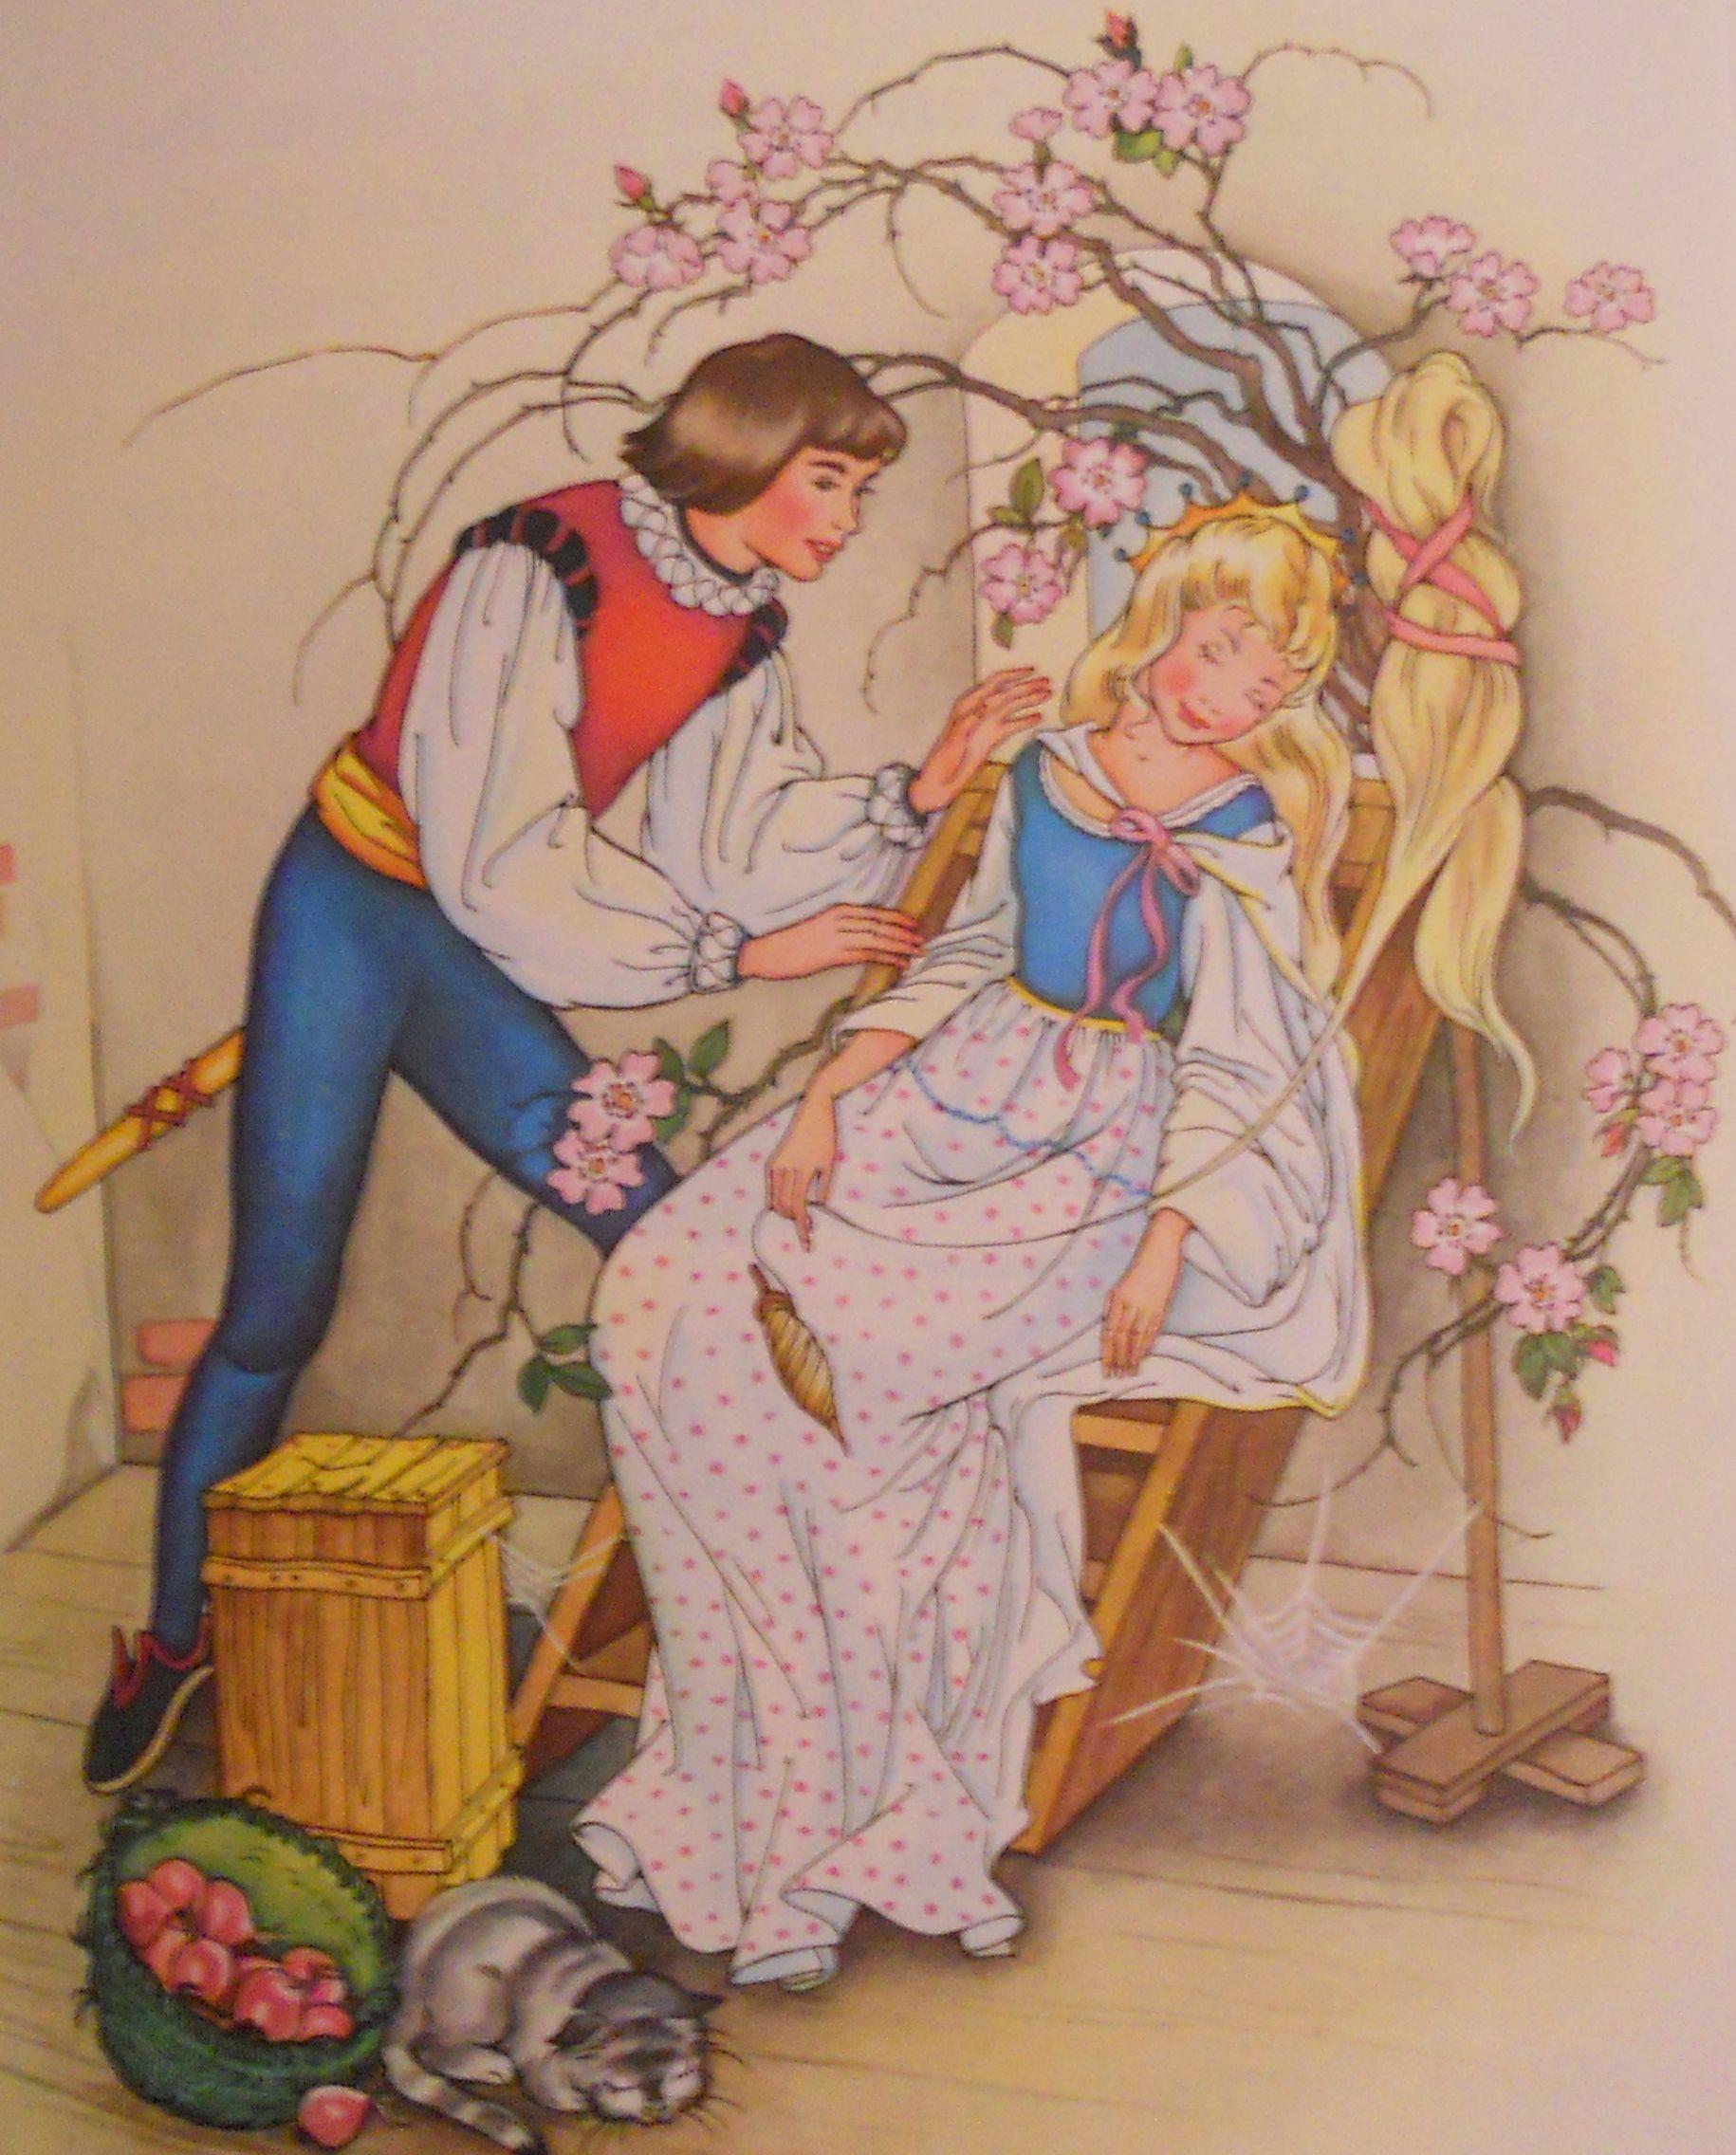 Mike Krome Original Art Grimm Fairy Tales #16 Cover ... |Grimm Fairy Tales Original Art